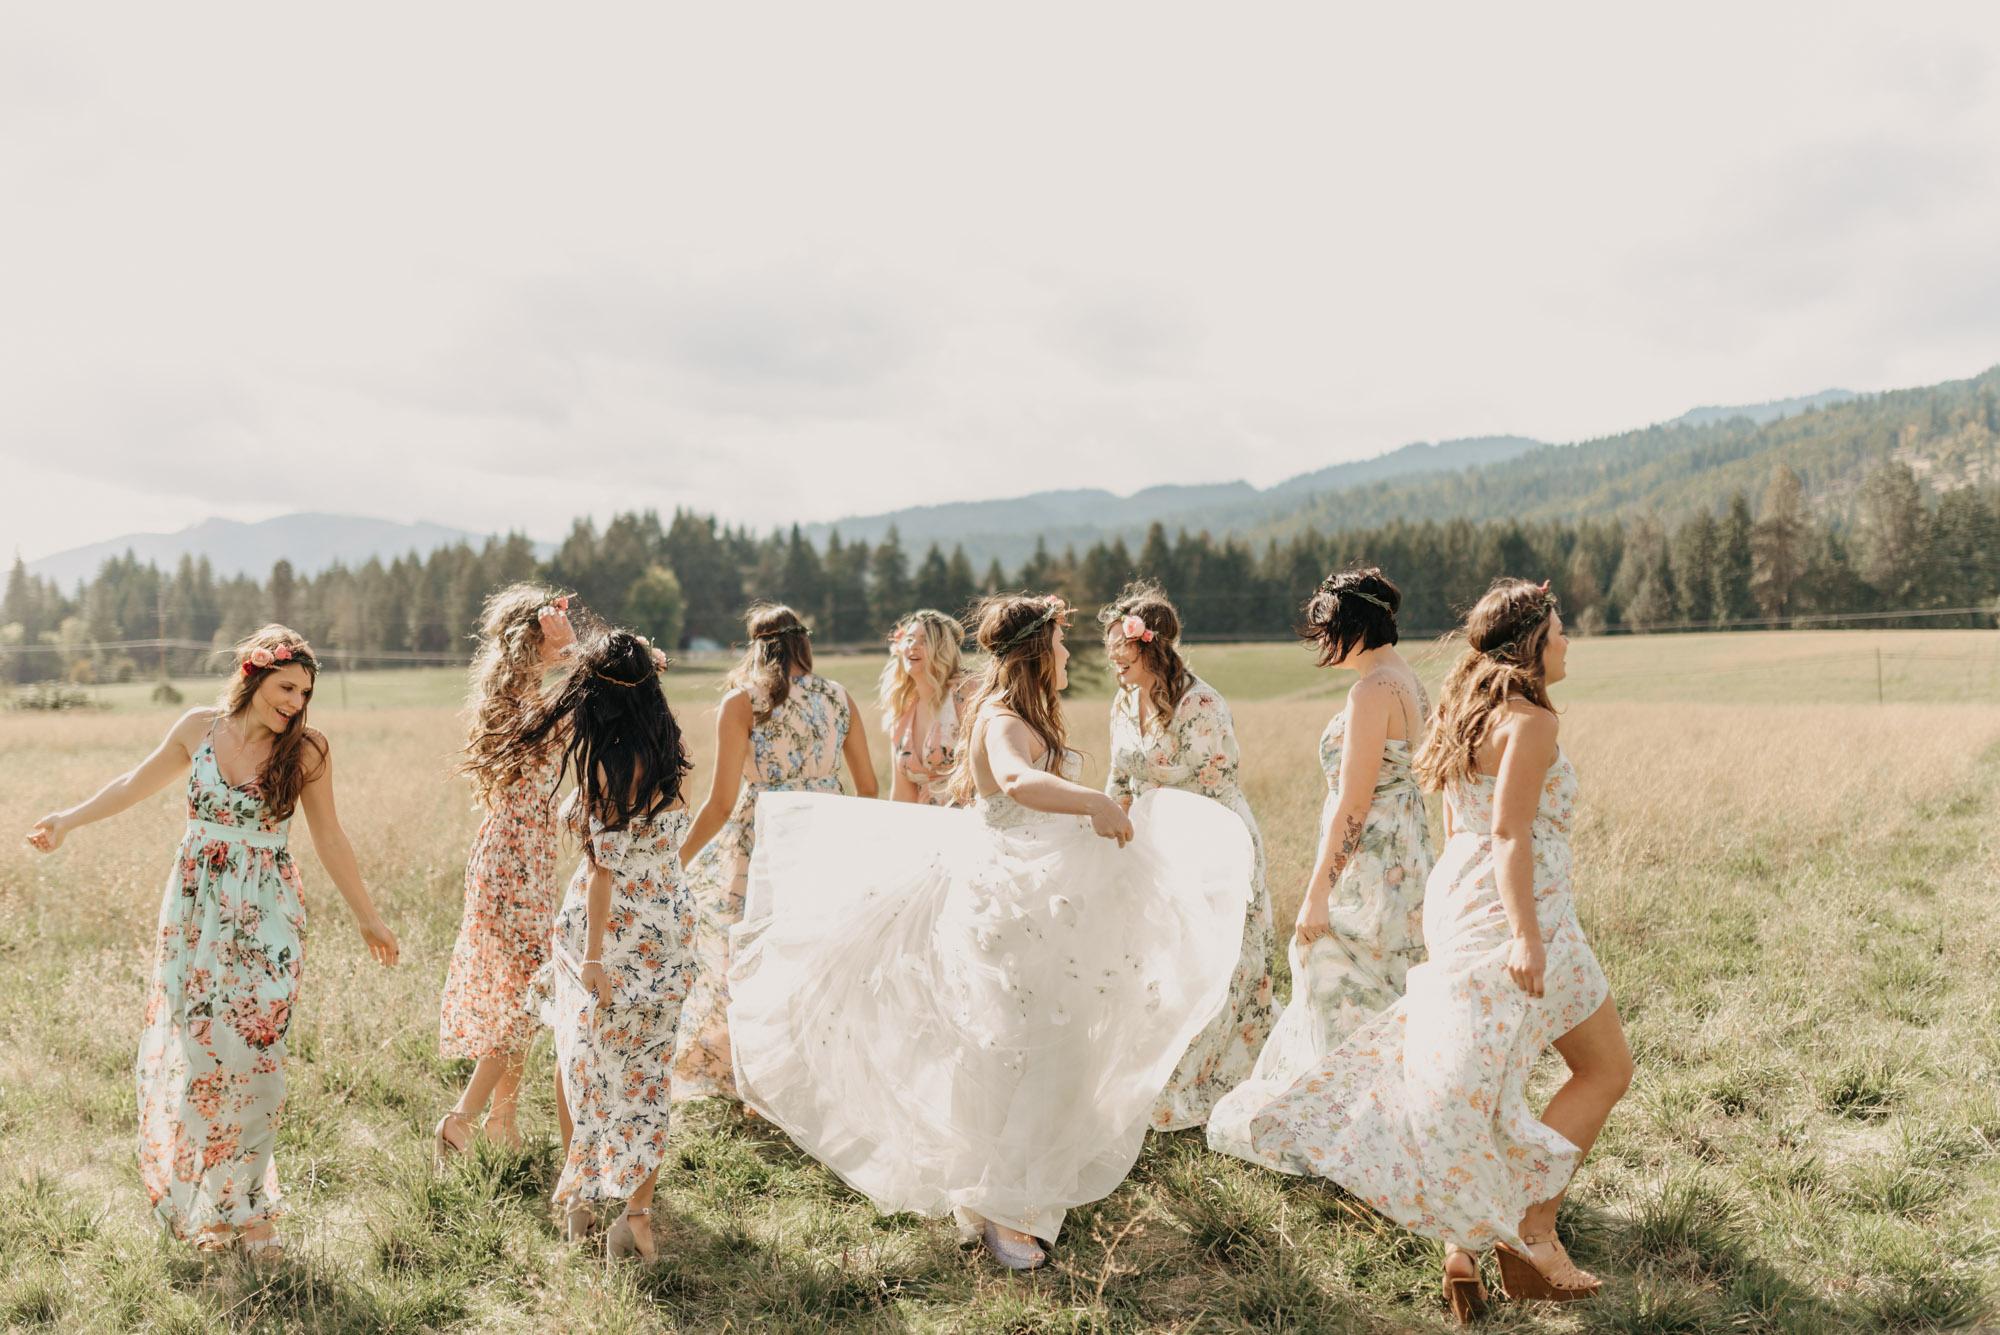 Bridal-Party-Free-People-Flower-Dresses-Washington-Wedding-8568.jpg